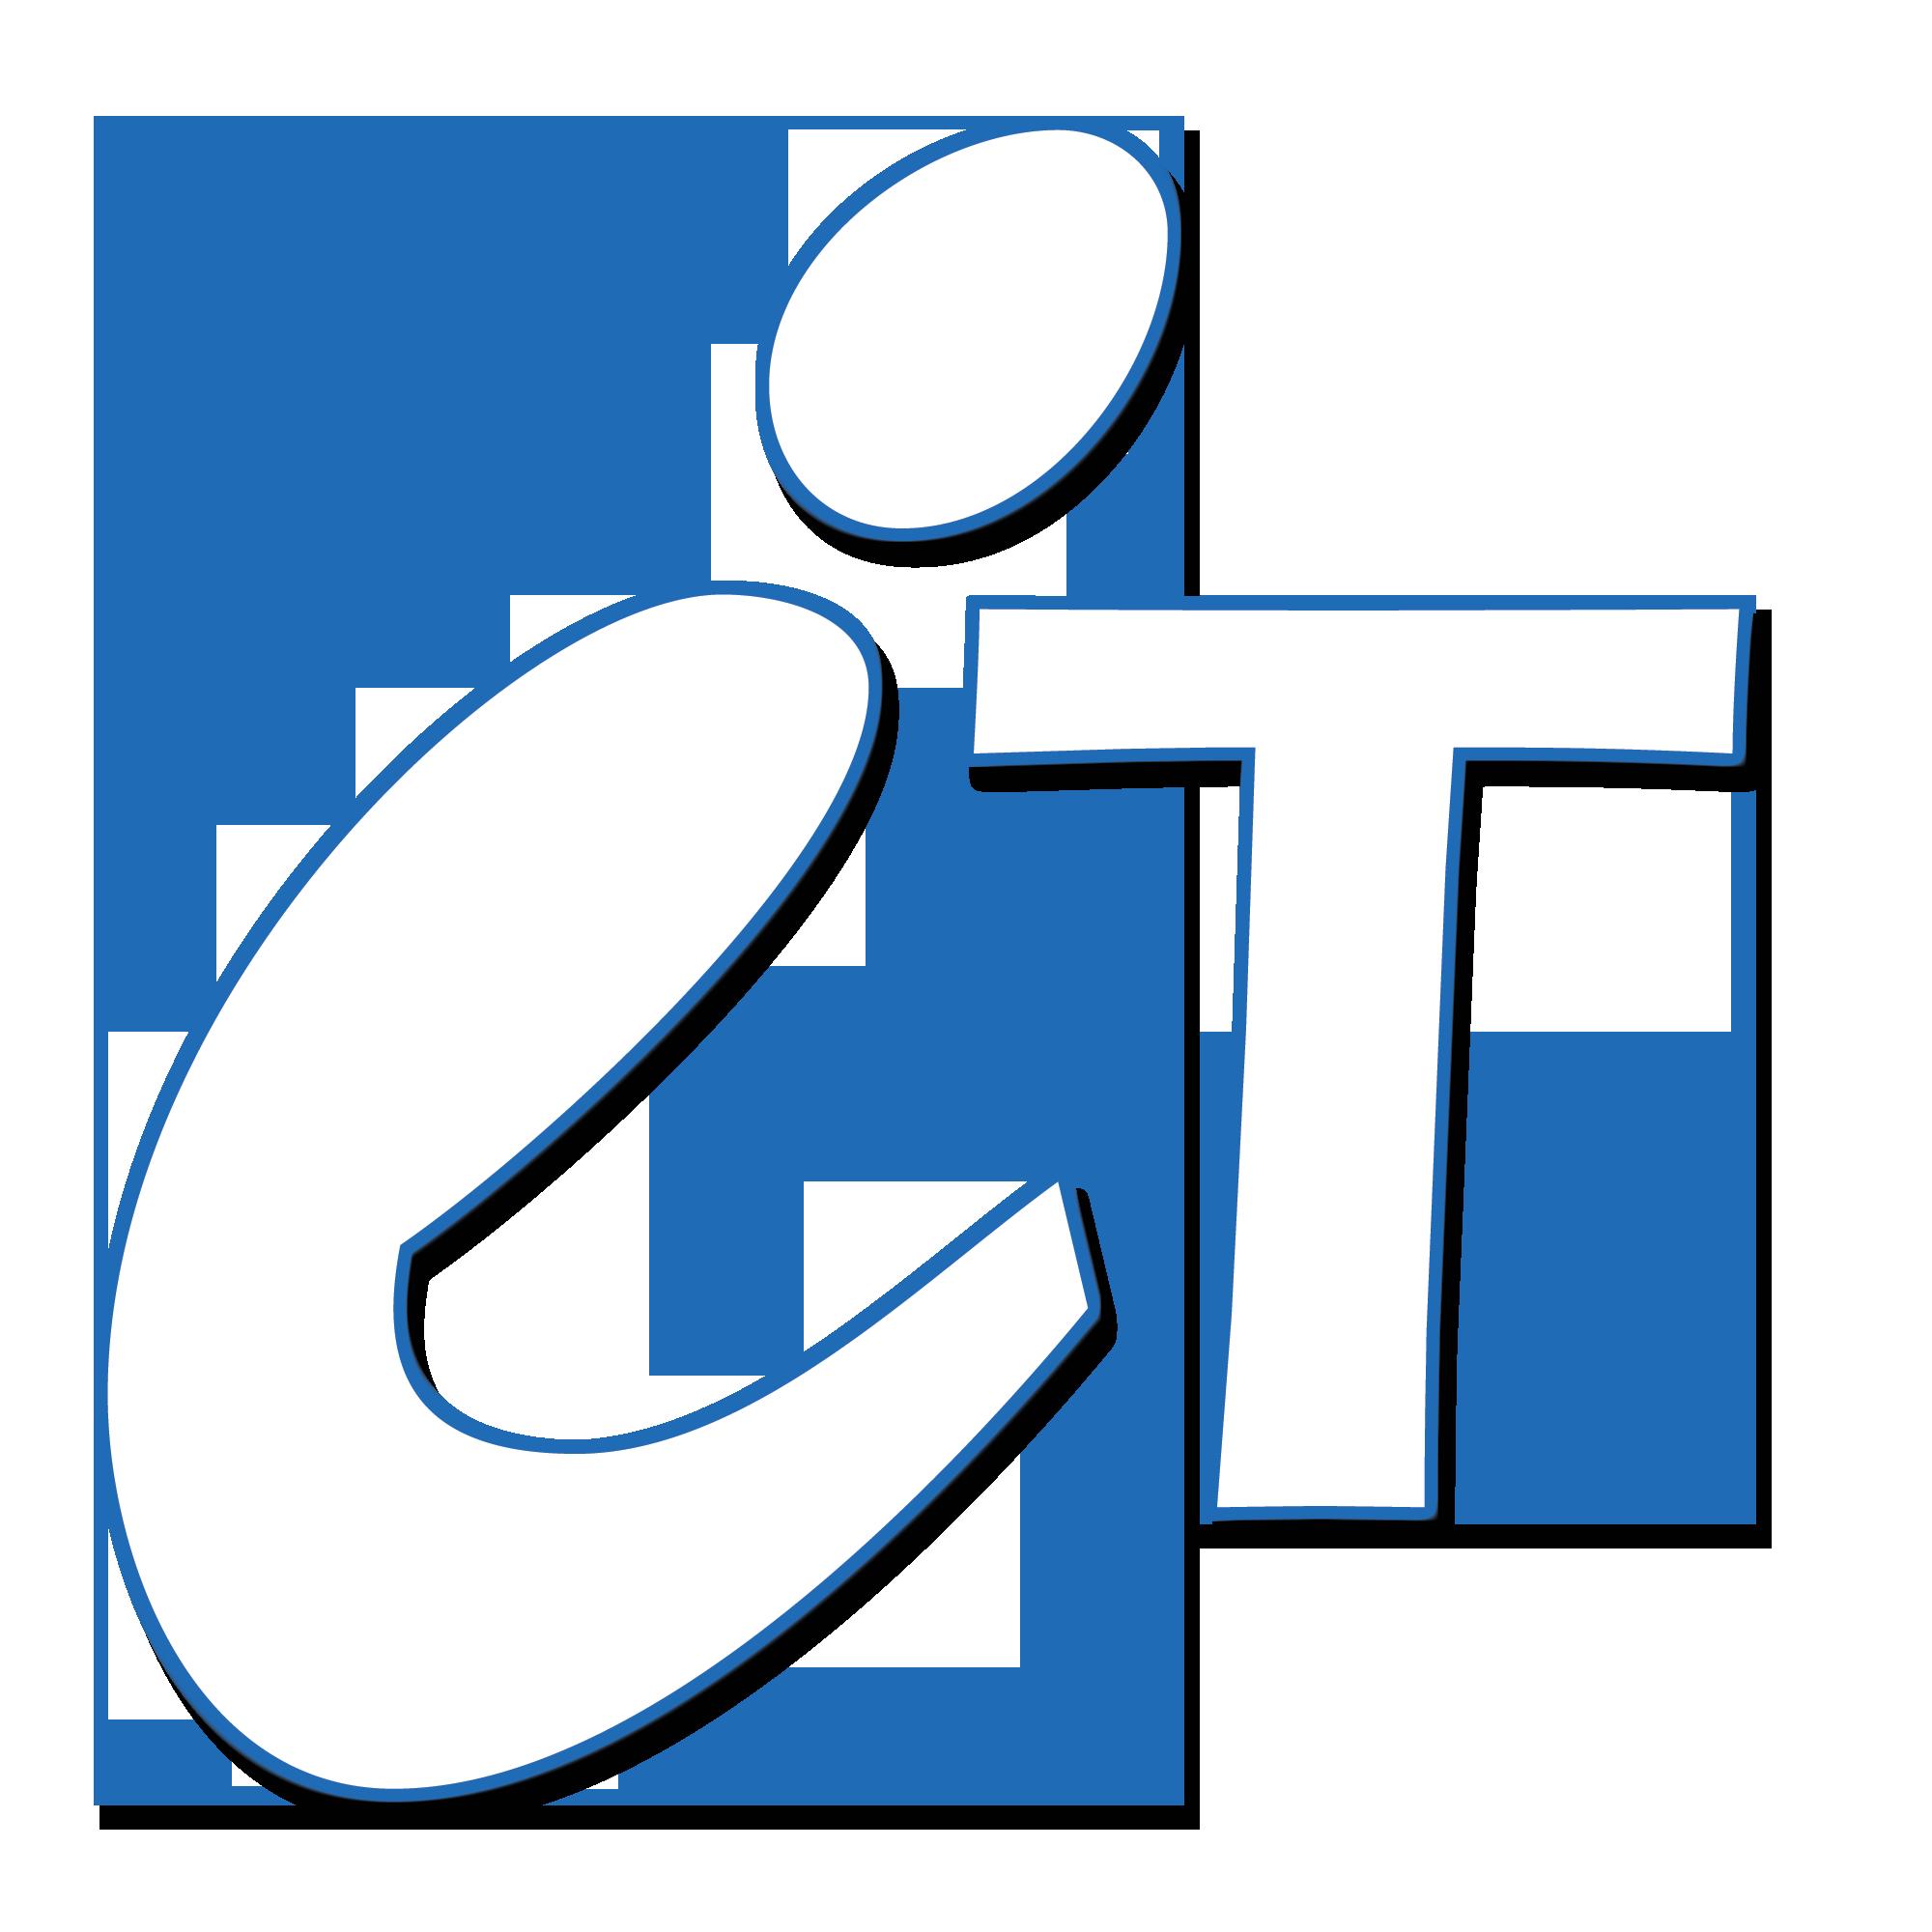 iTransfer iT